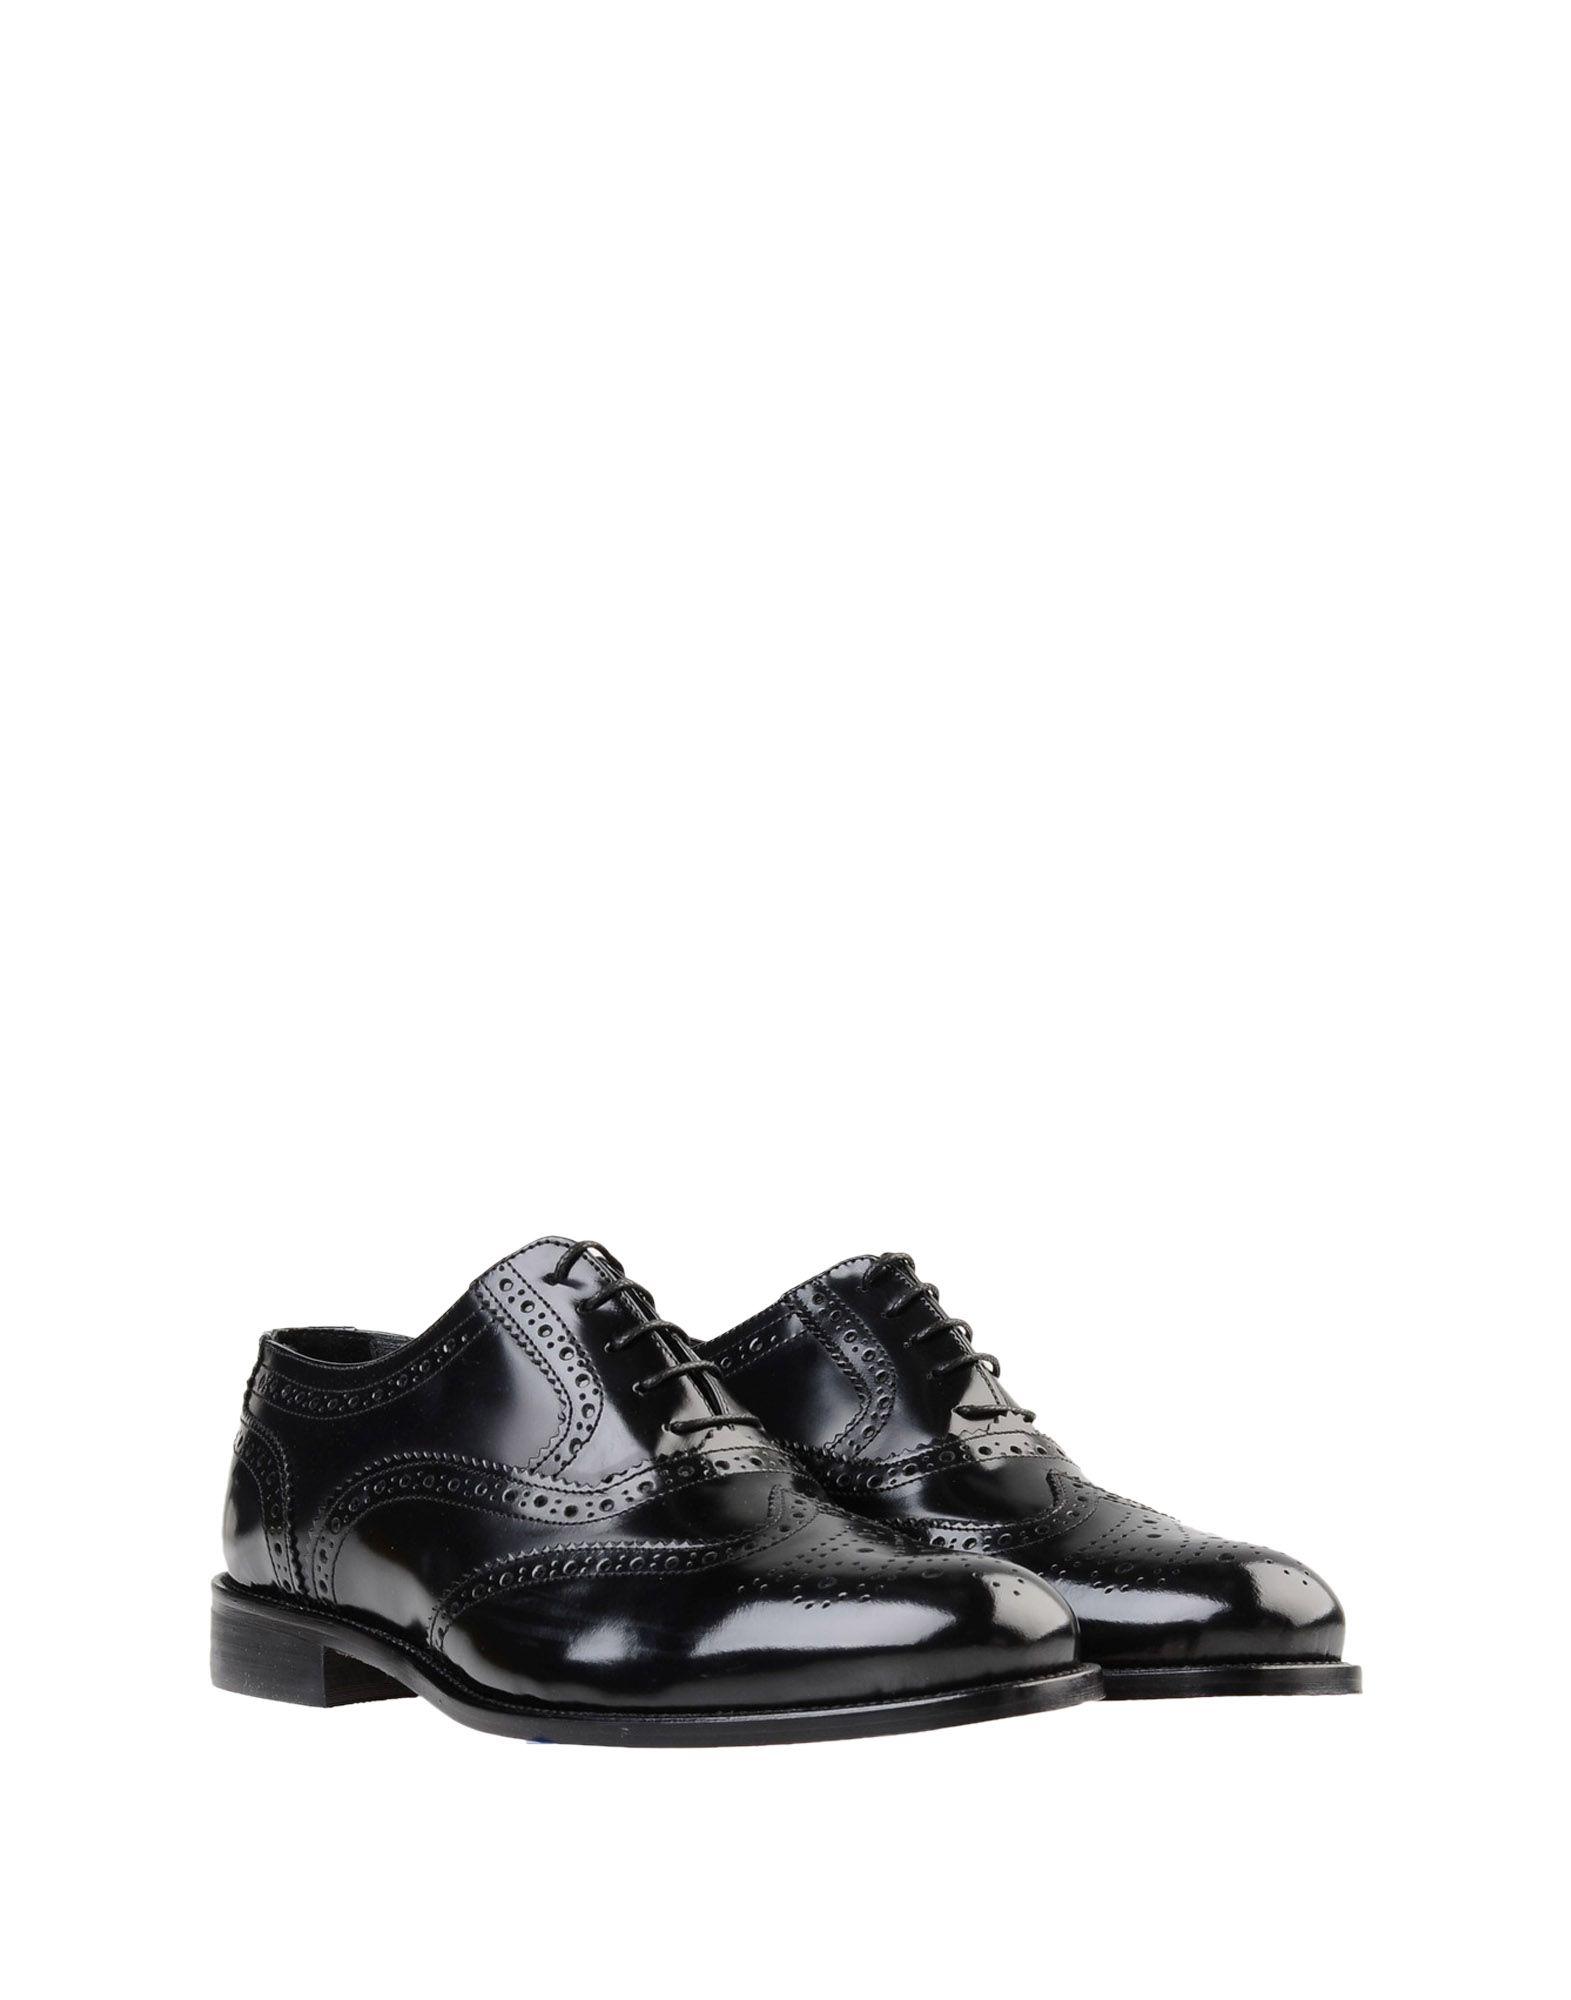 Chaussures À Lacets Antica Calzoleria Campana Femme - Chaussures À Lacets Antica Calzoleria Campana sur